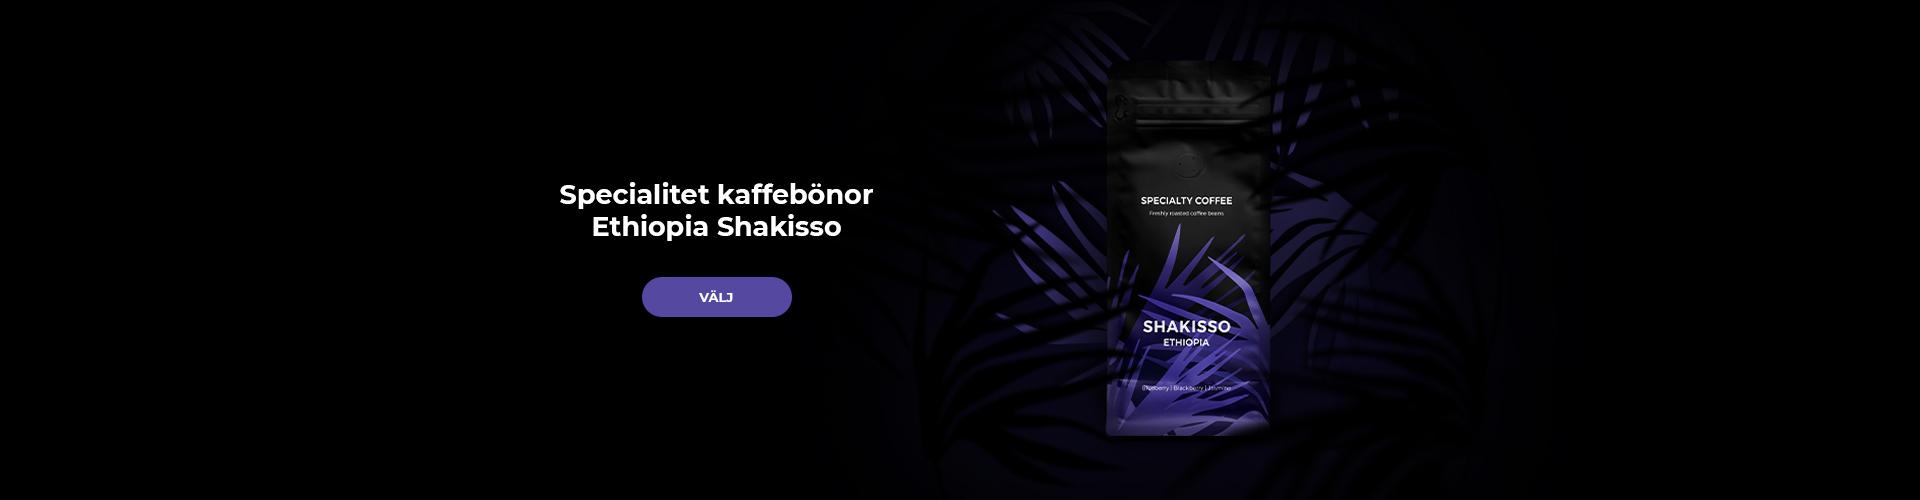 Specialty coffee Ethiopia Shakisso